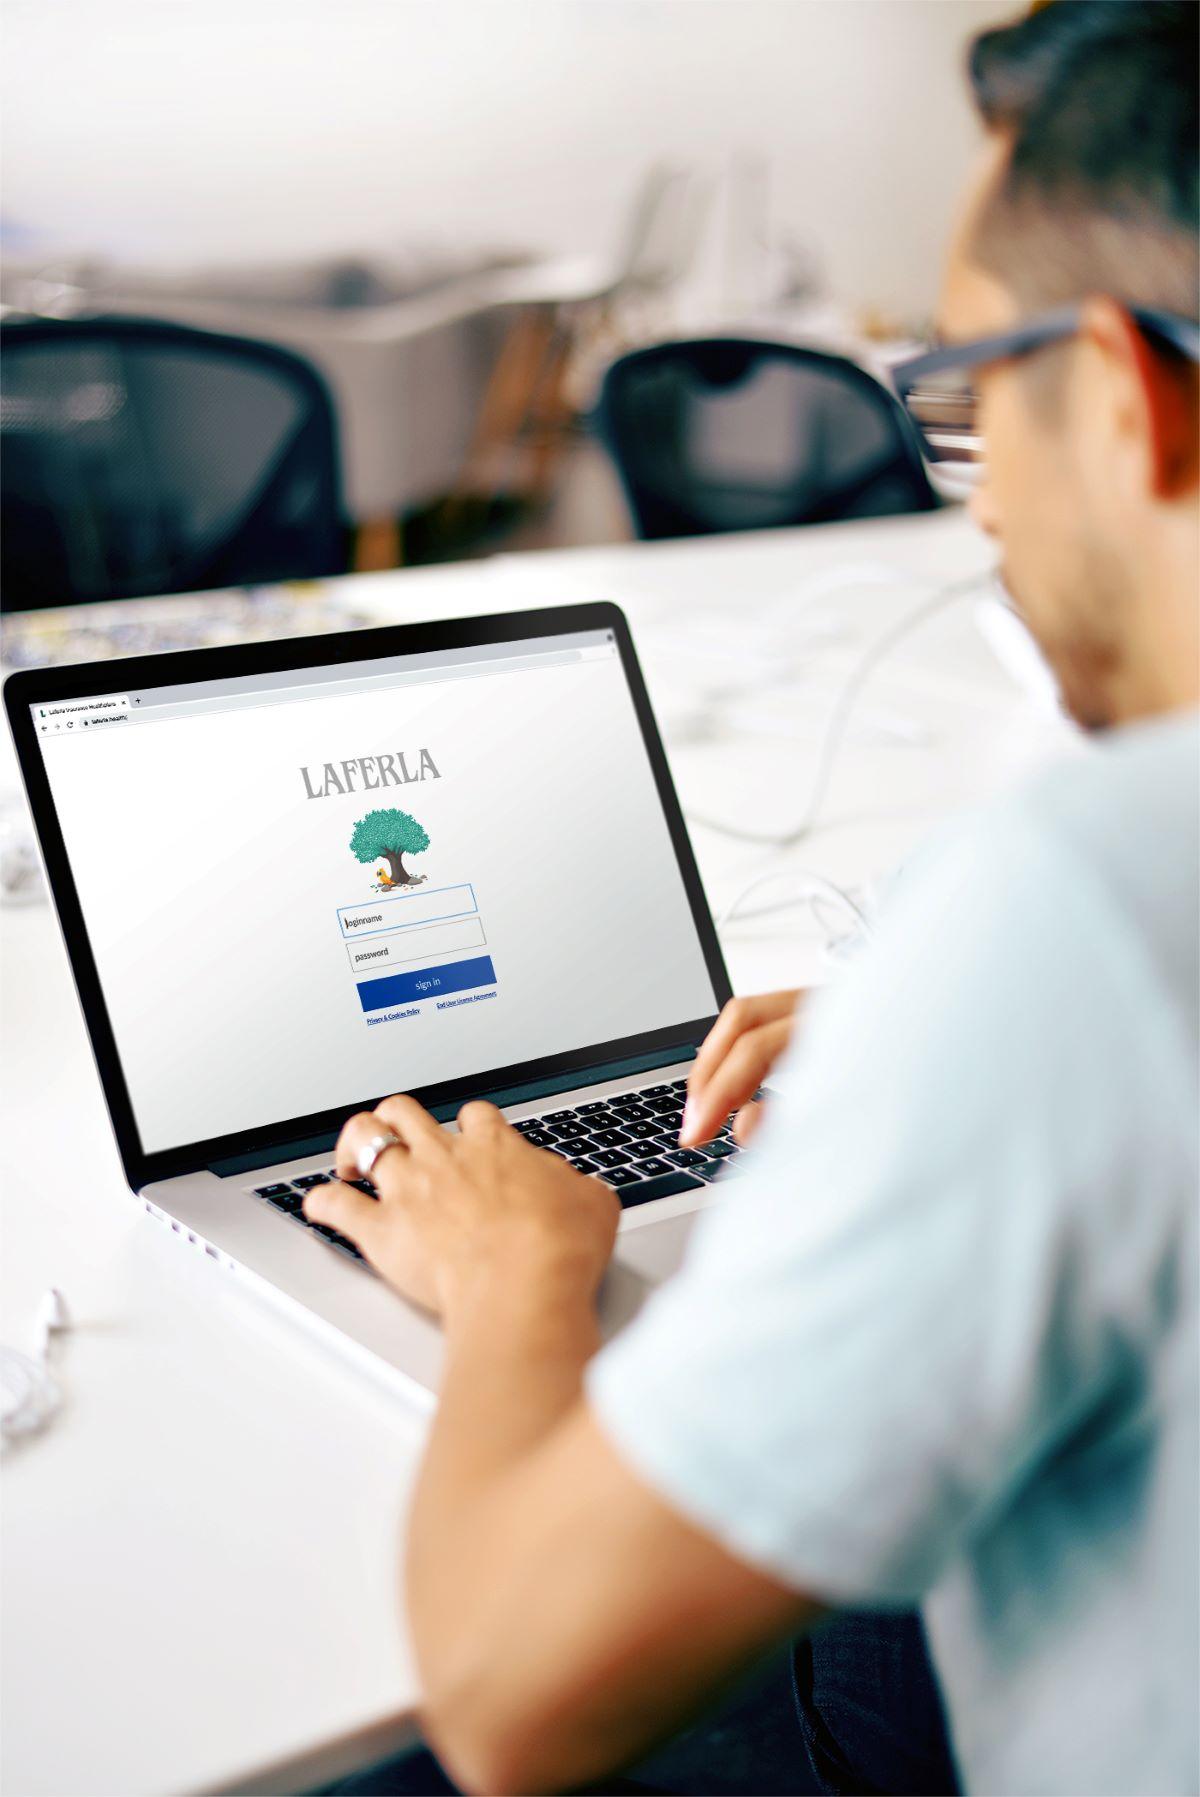 Laferla Health System